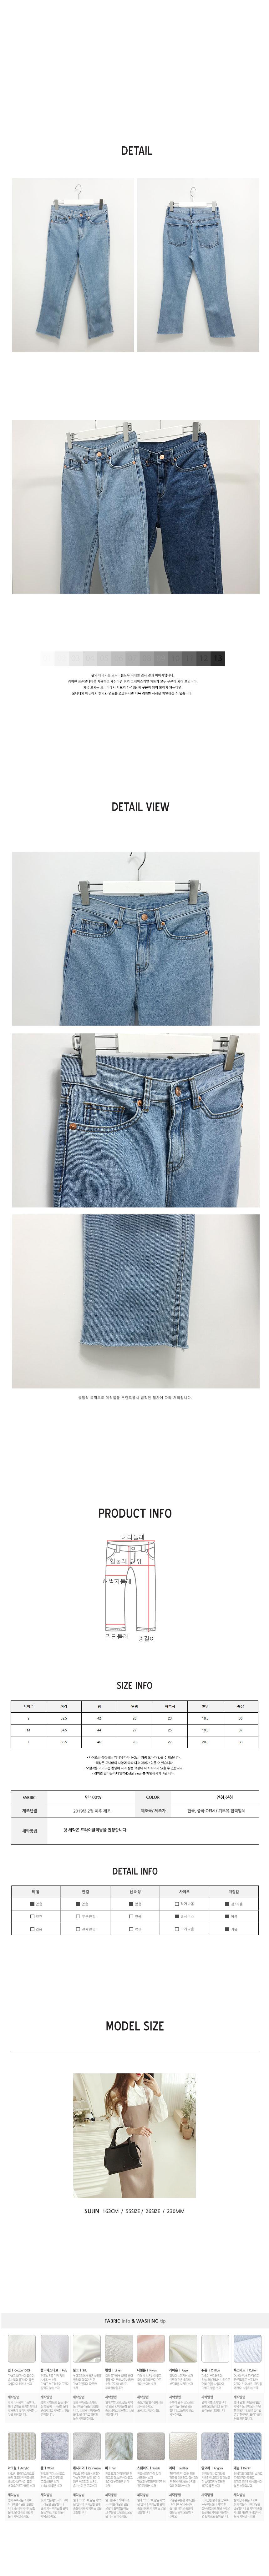 Ronnie slim jeans